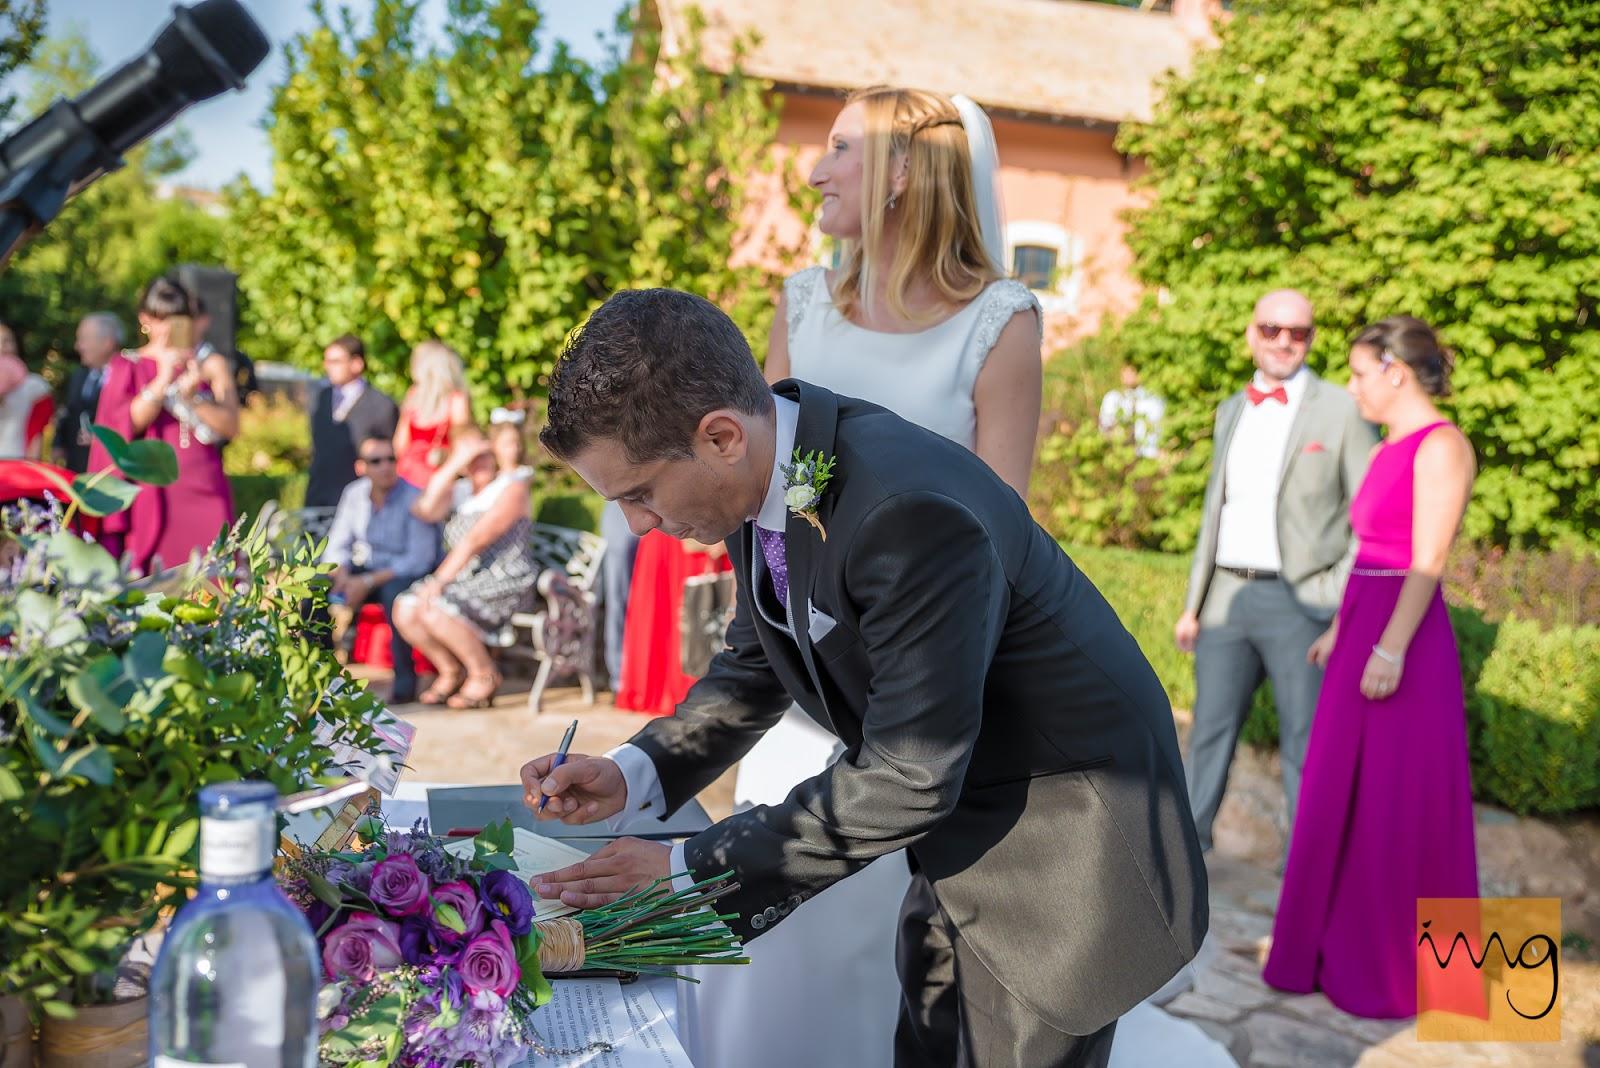 La fotografía de la firma en la boda